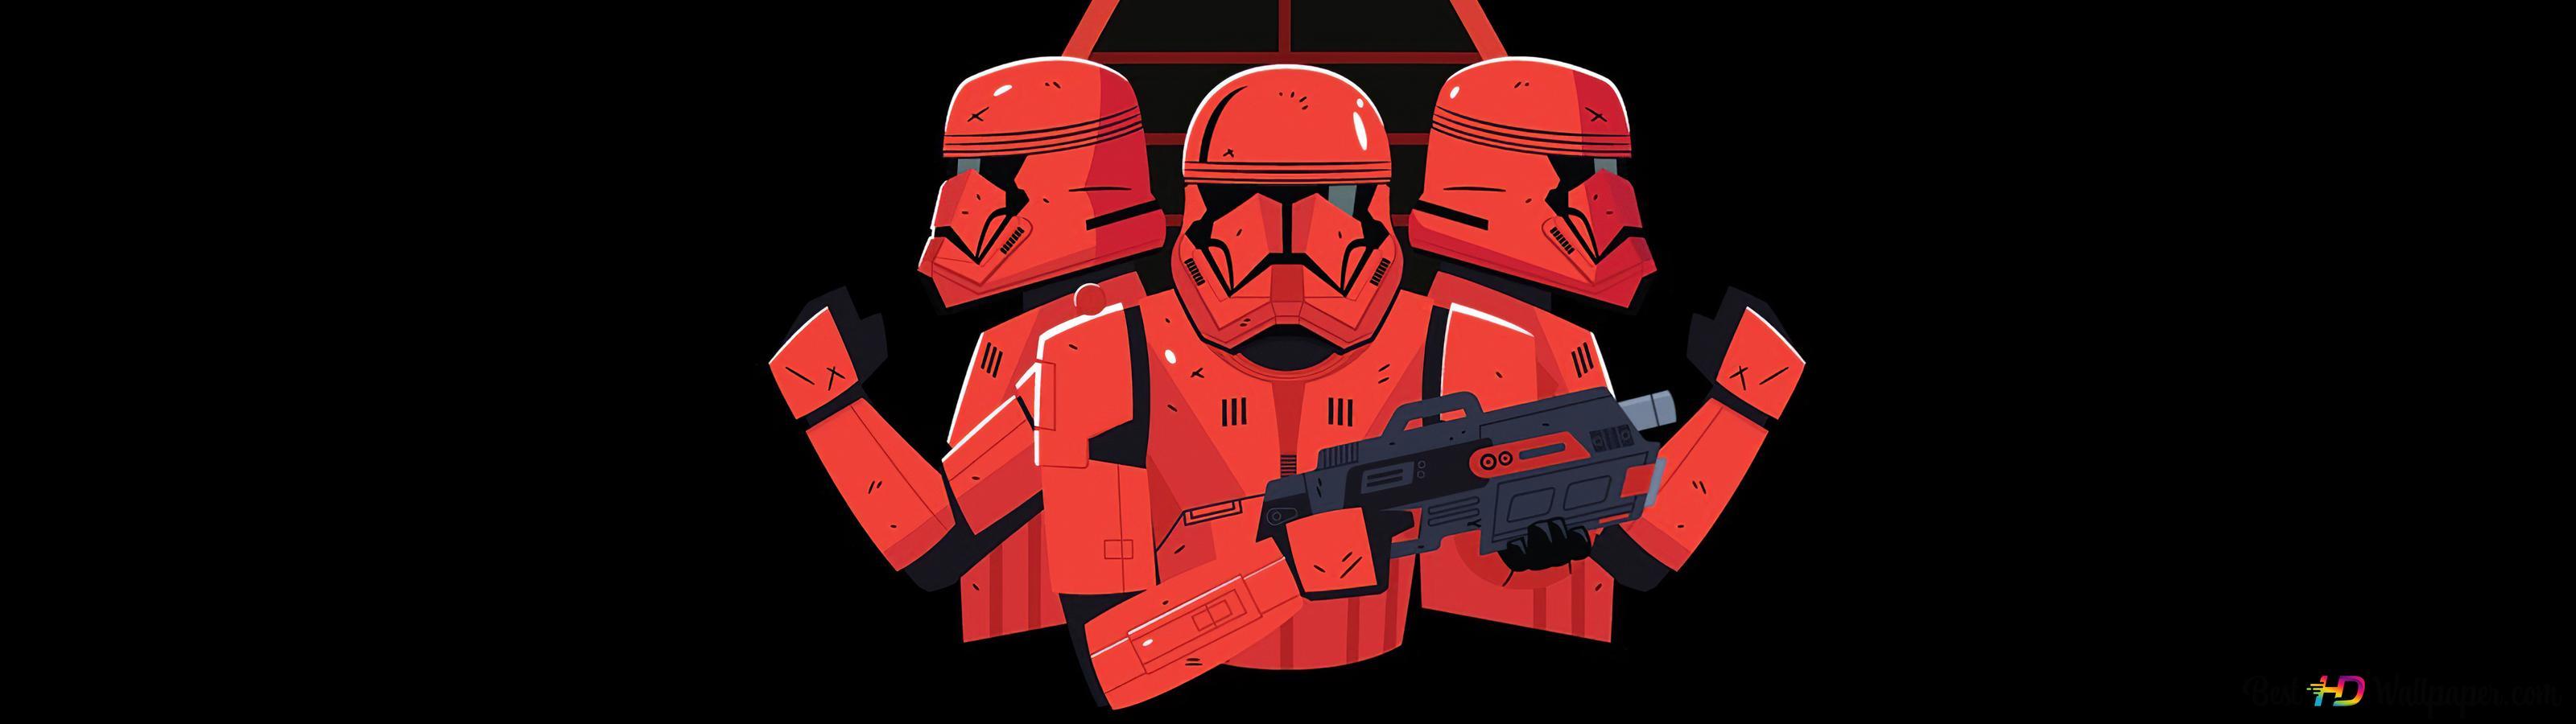 Sith Trooper Star Wars Hd Wallpaper Download